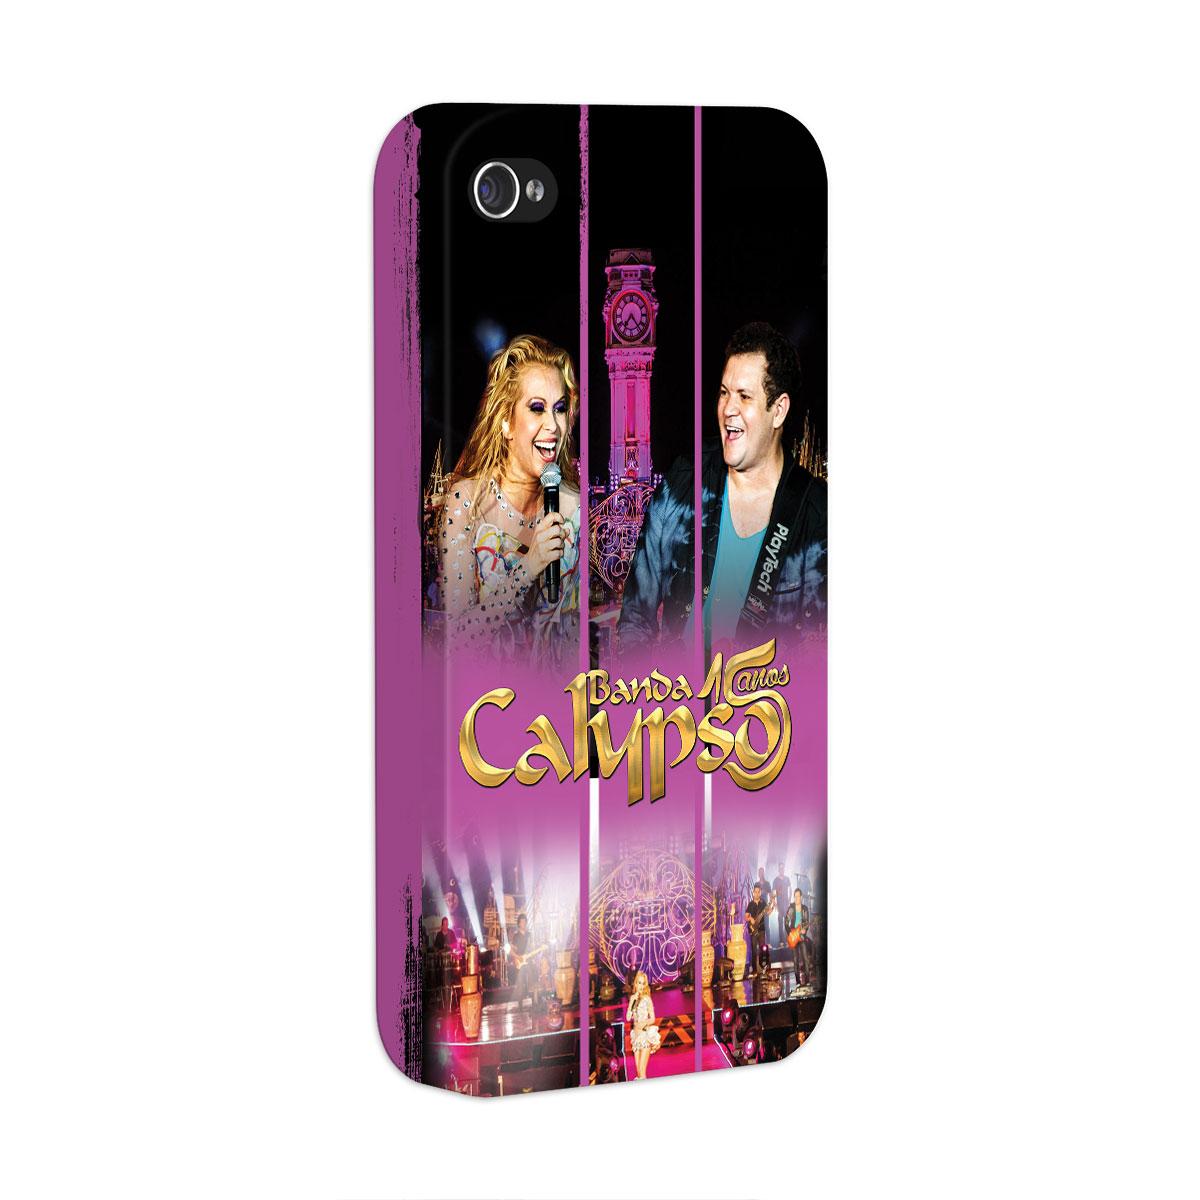 Capa de iPhone 4/4S Calypso 15 Anos